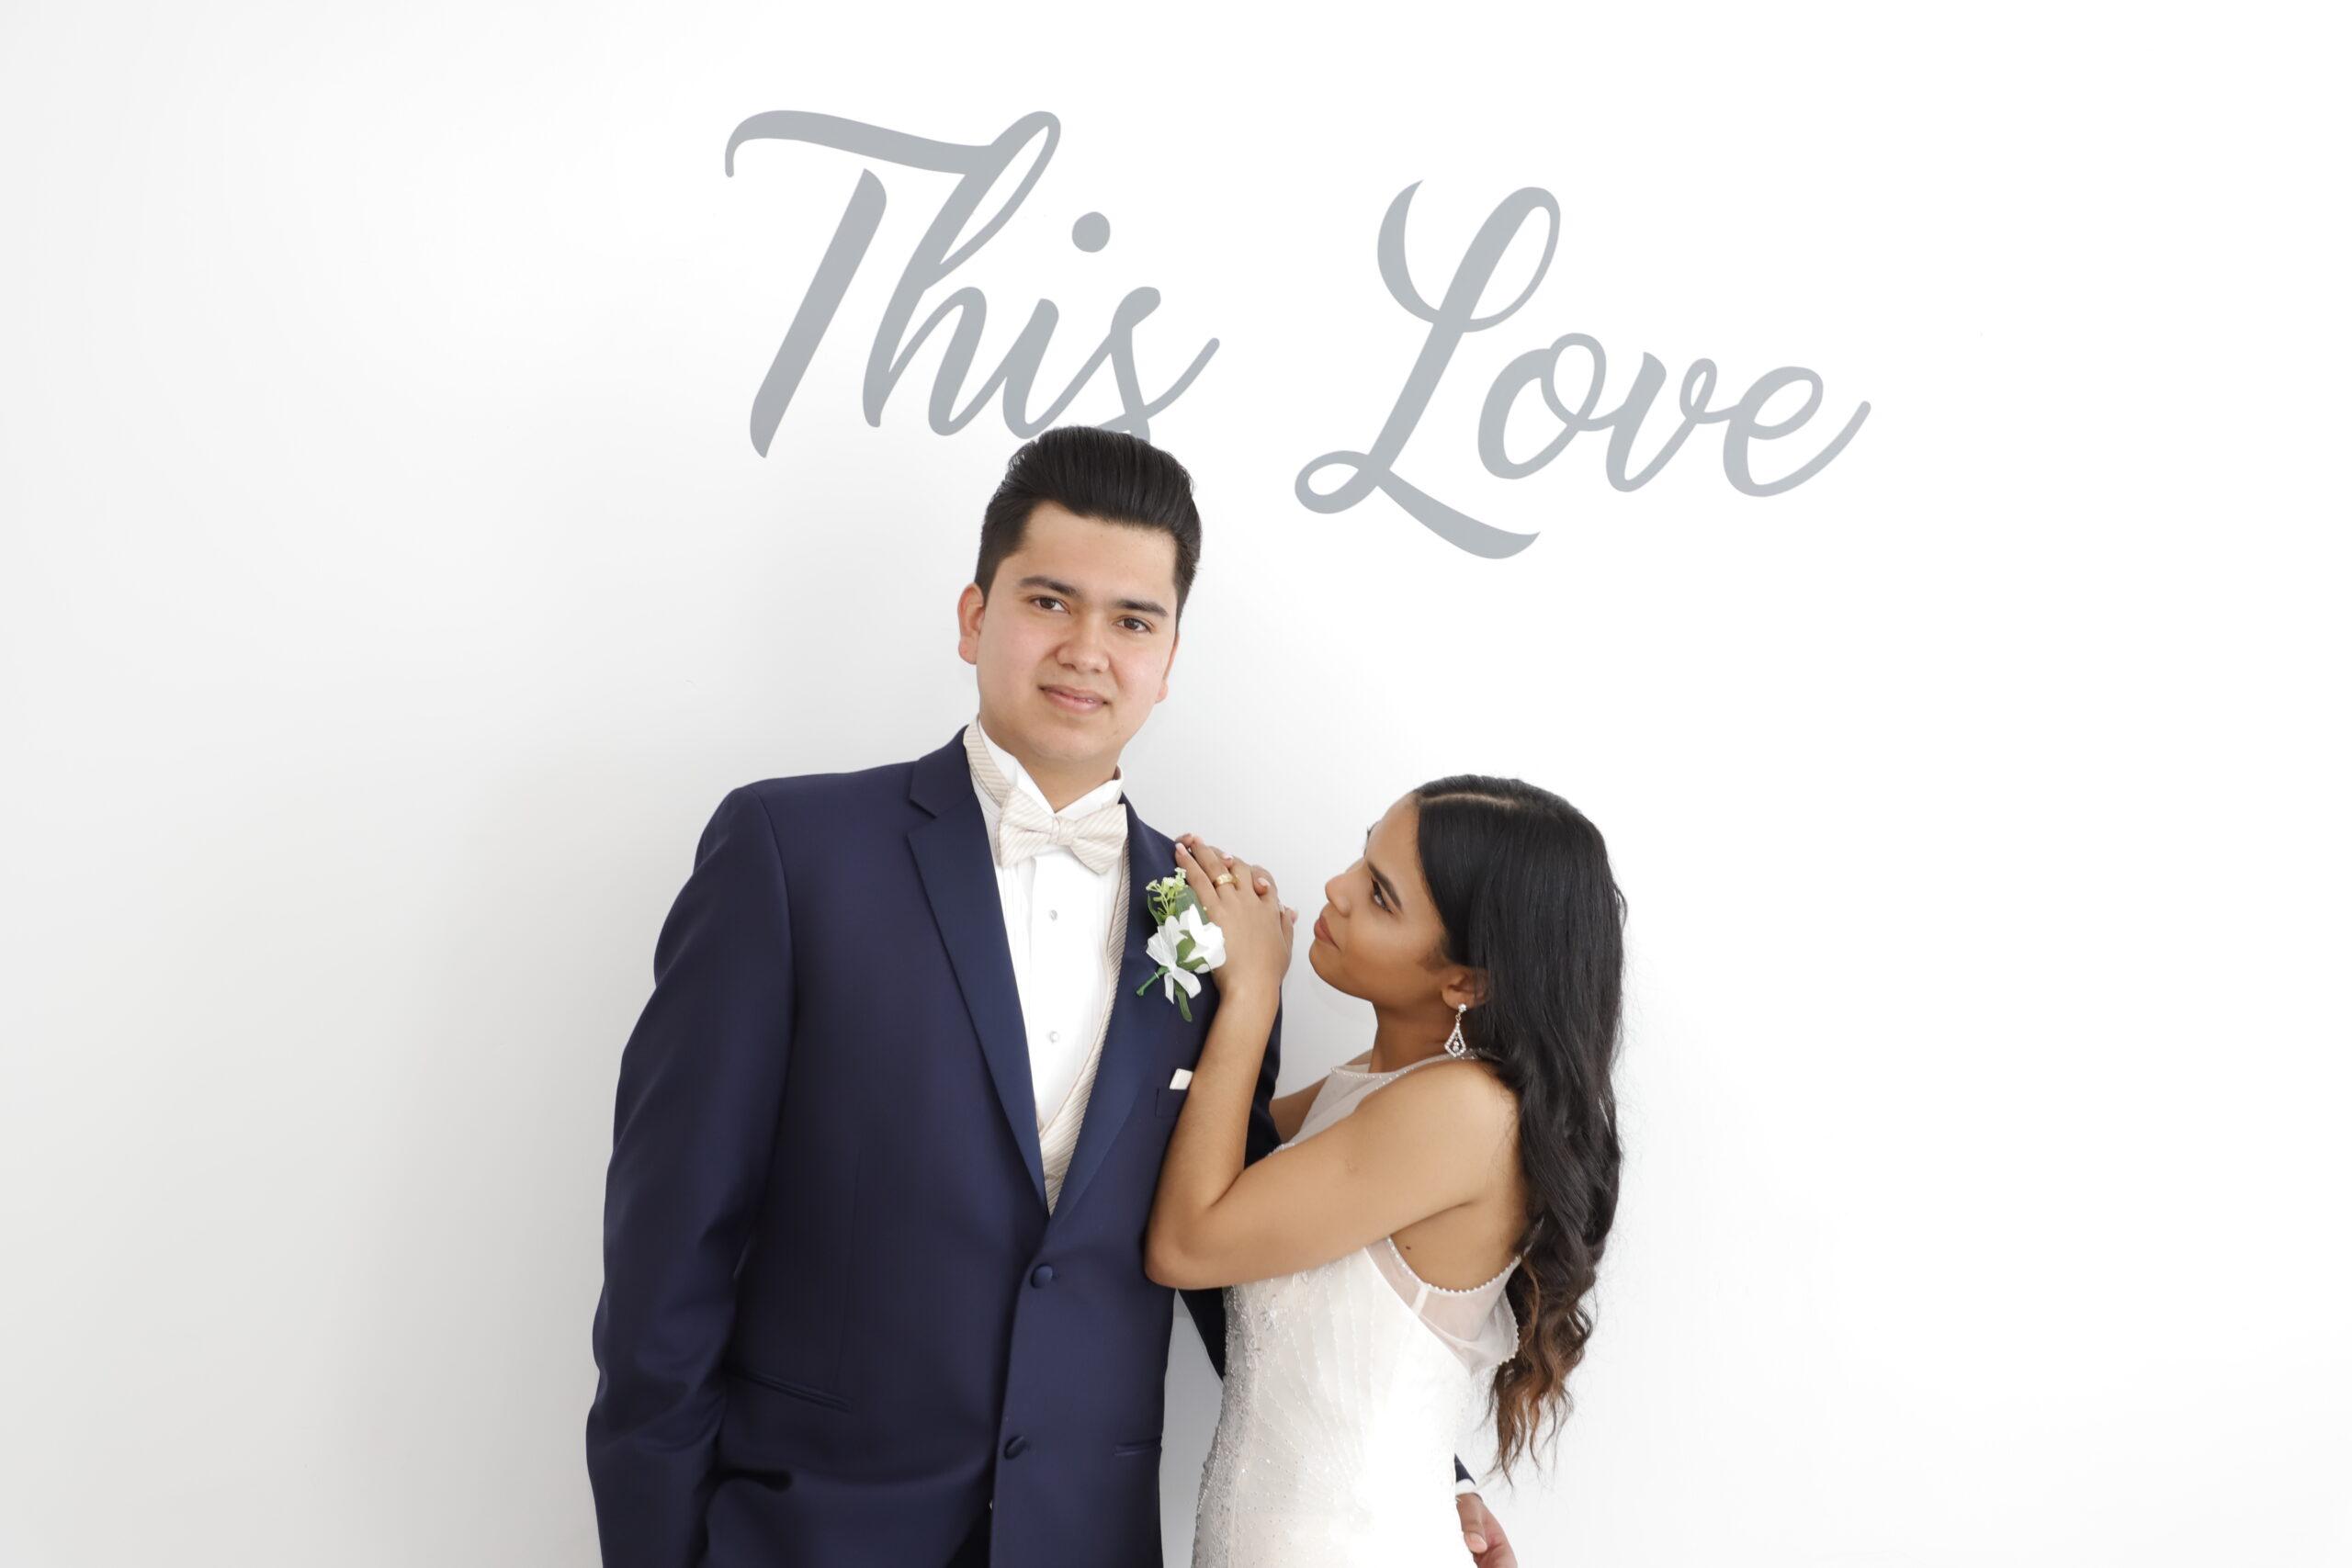 las vegas wedding chapelss